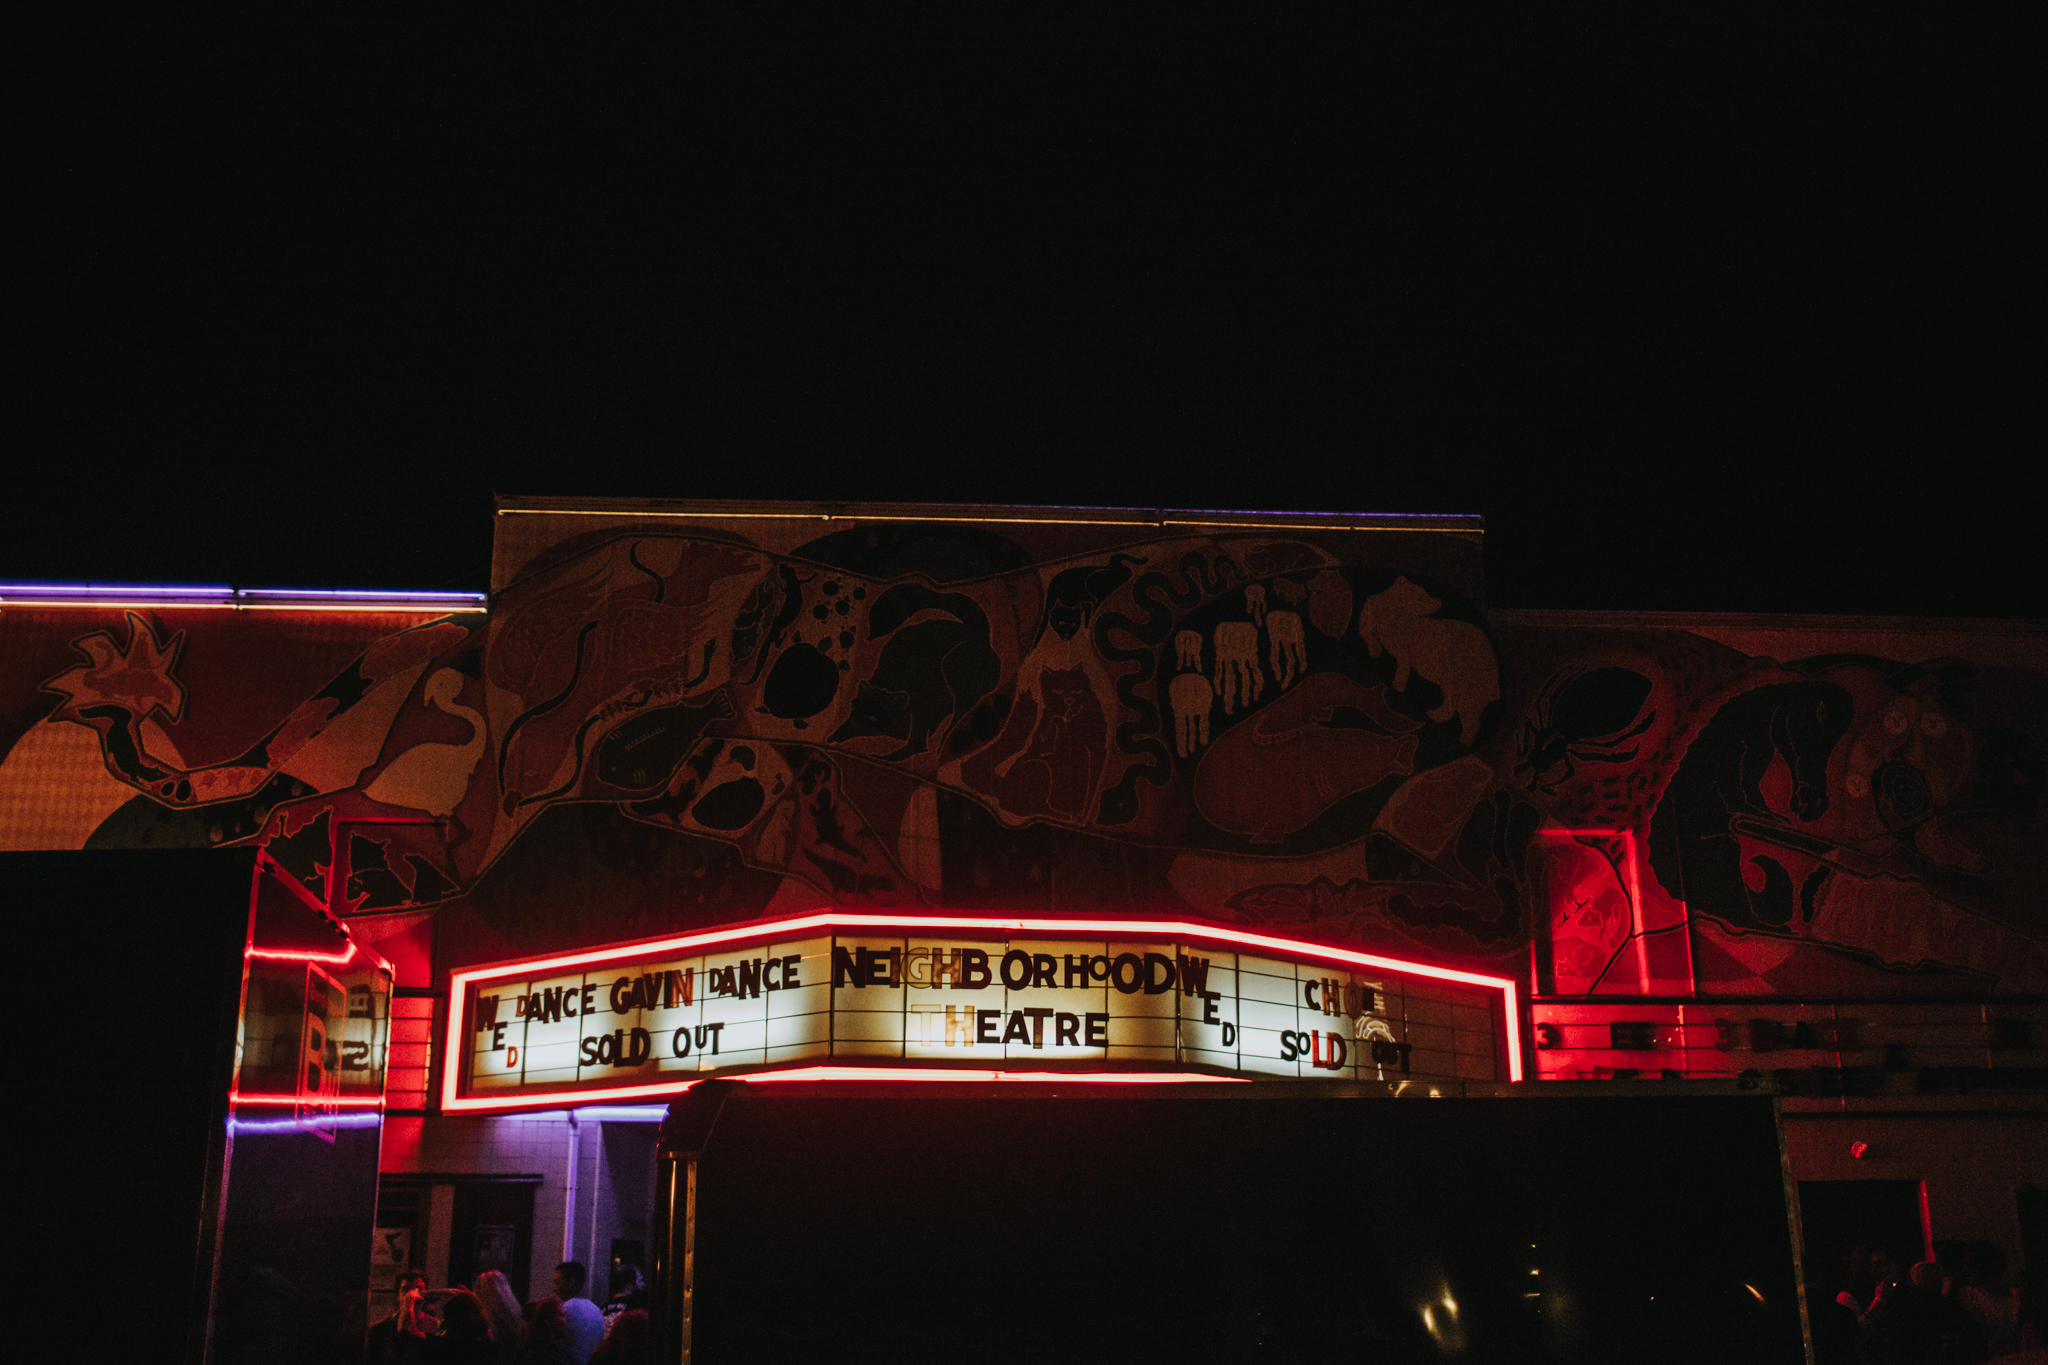 Lafferty Photo - Dance Gavin Dance 03.08.17-8919.jpg